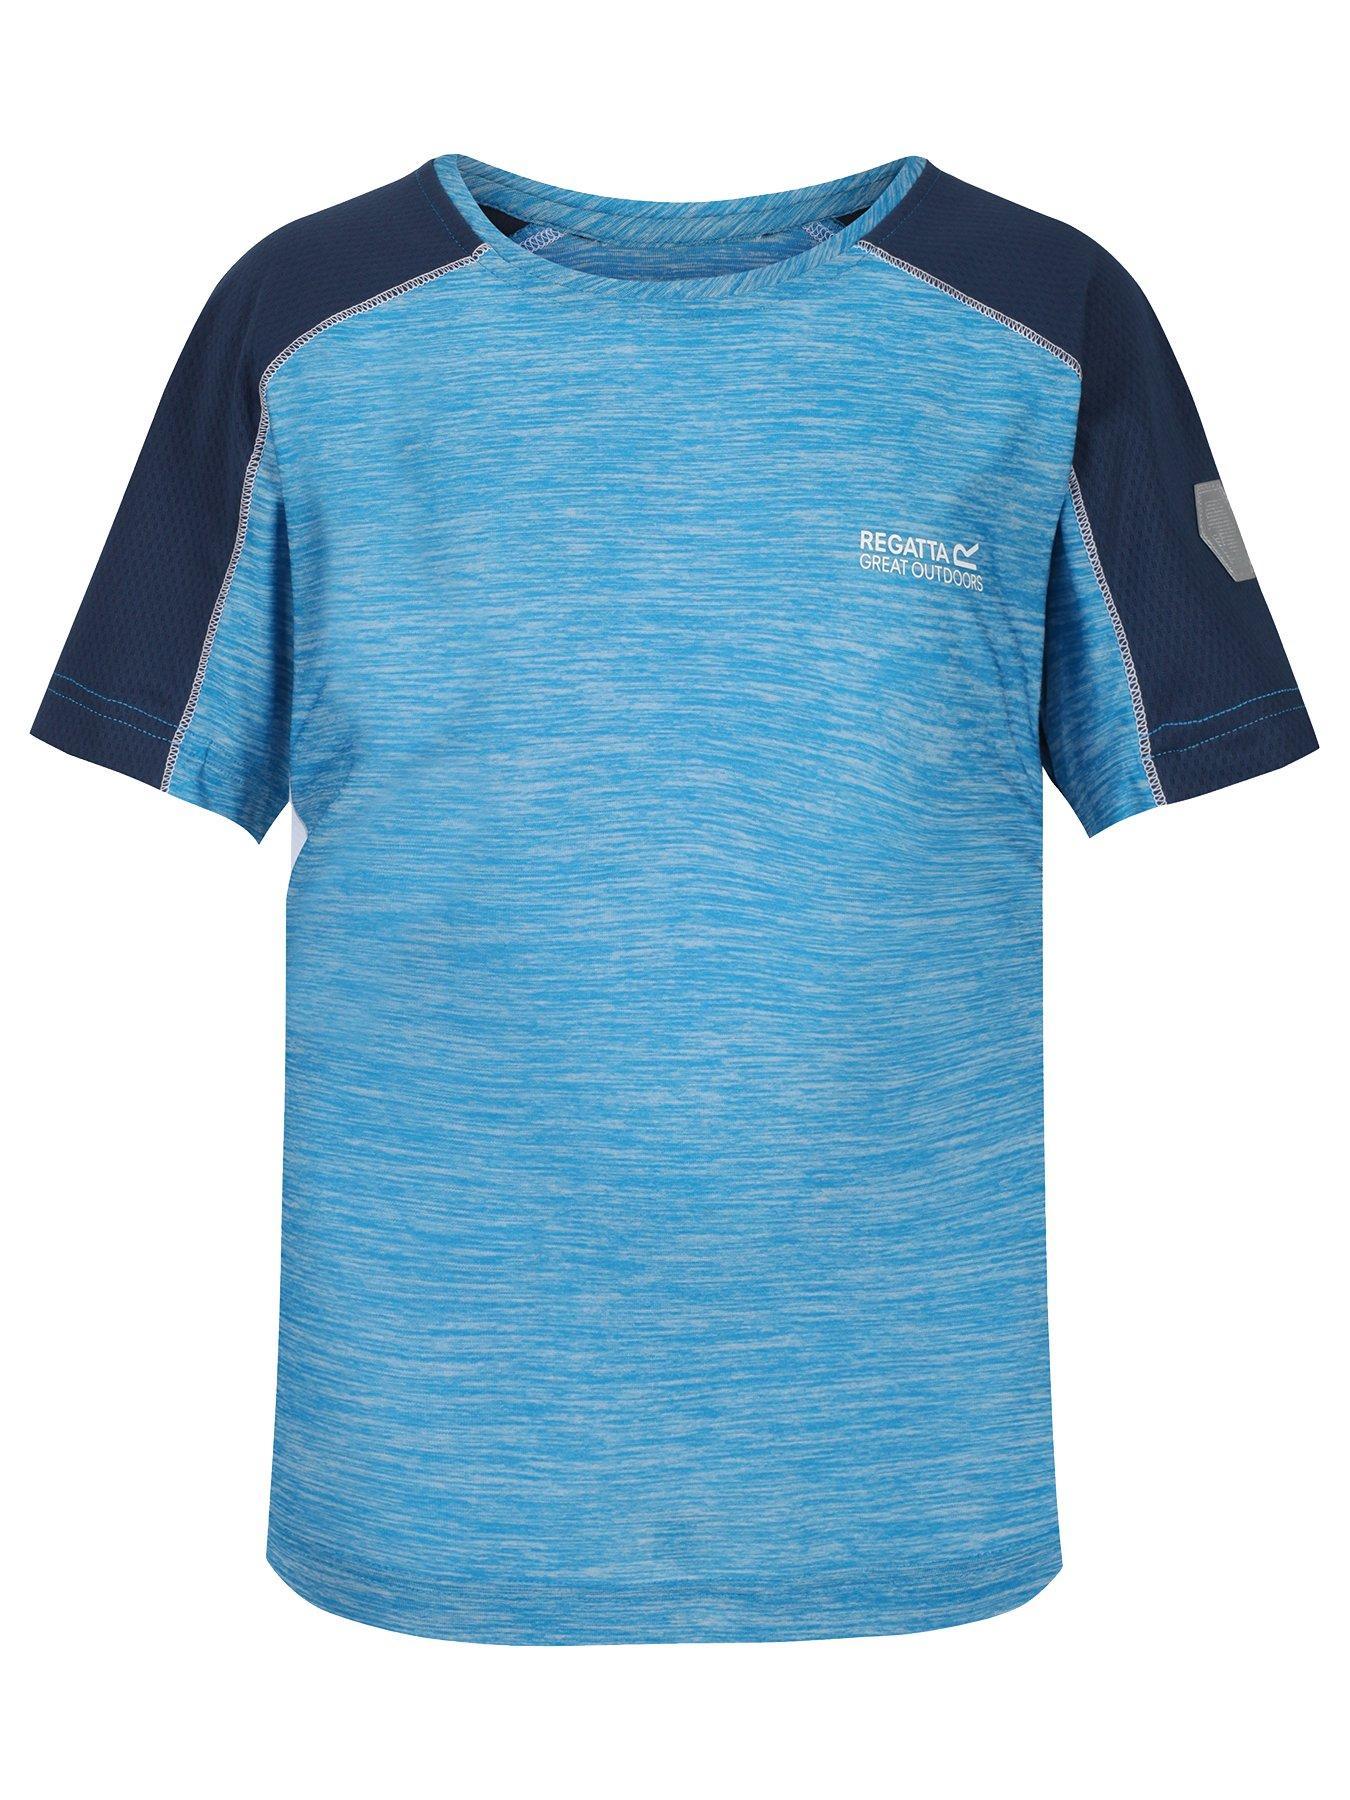 Born To Ride Bike Boys Girls Sports Kids T Shirt Gift Present  Sizes 1-13 Years